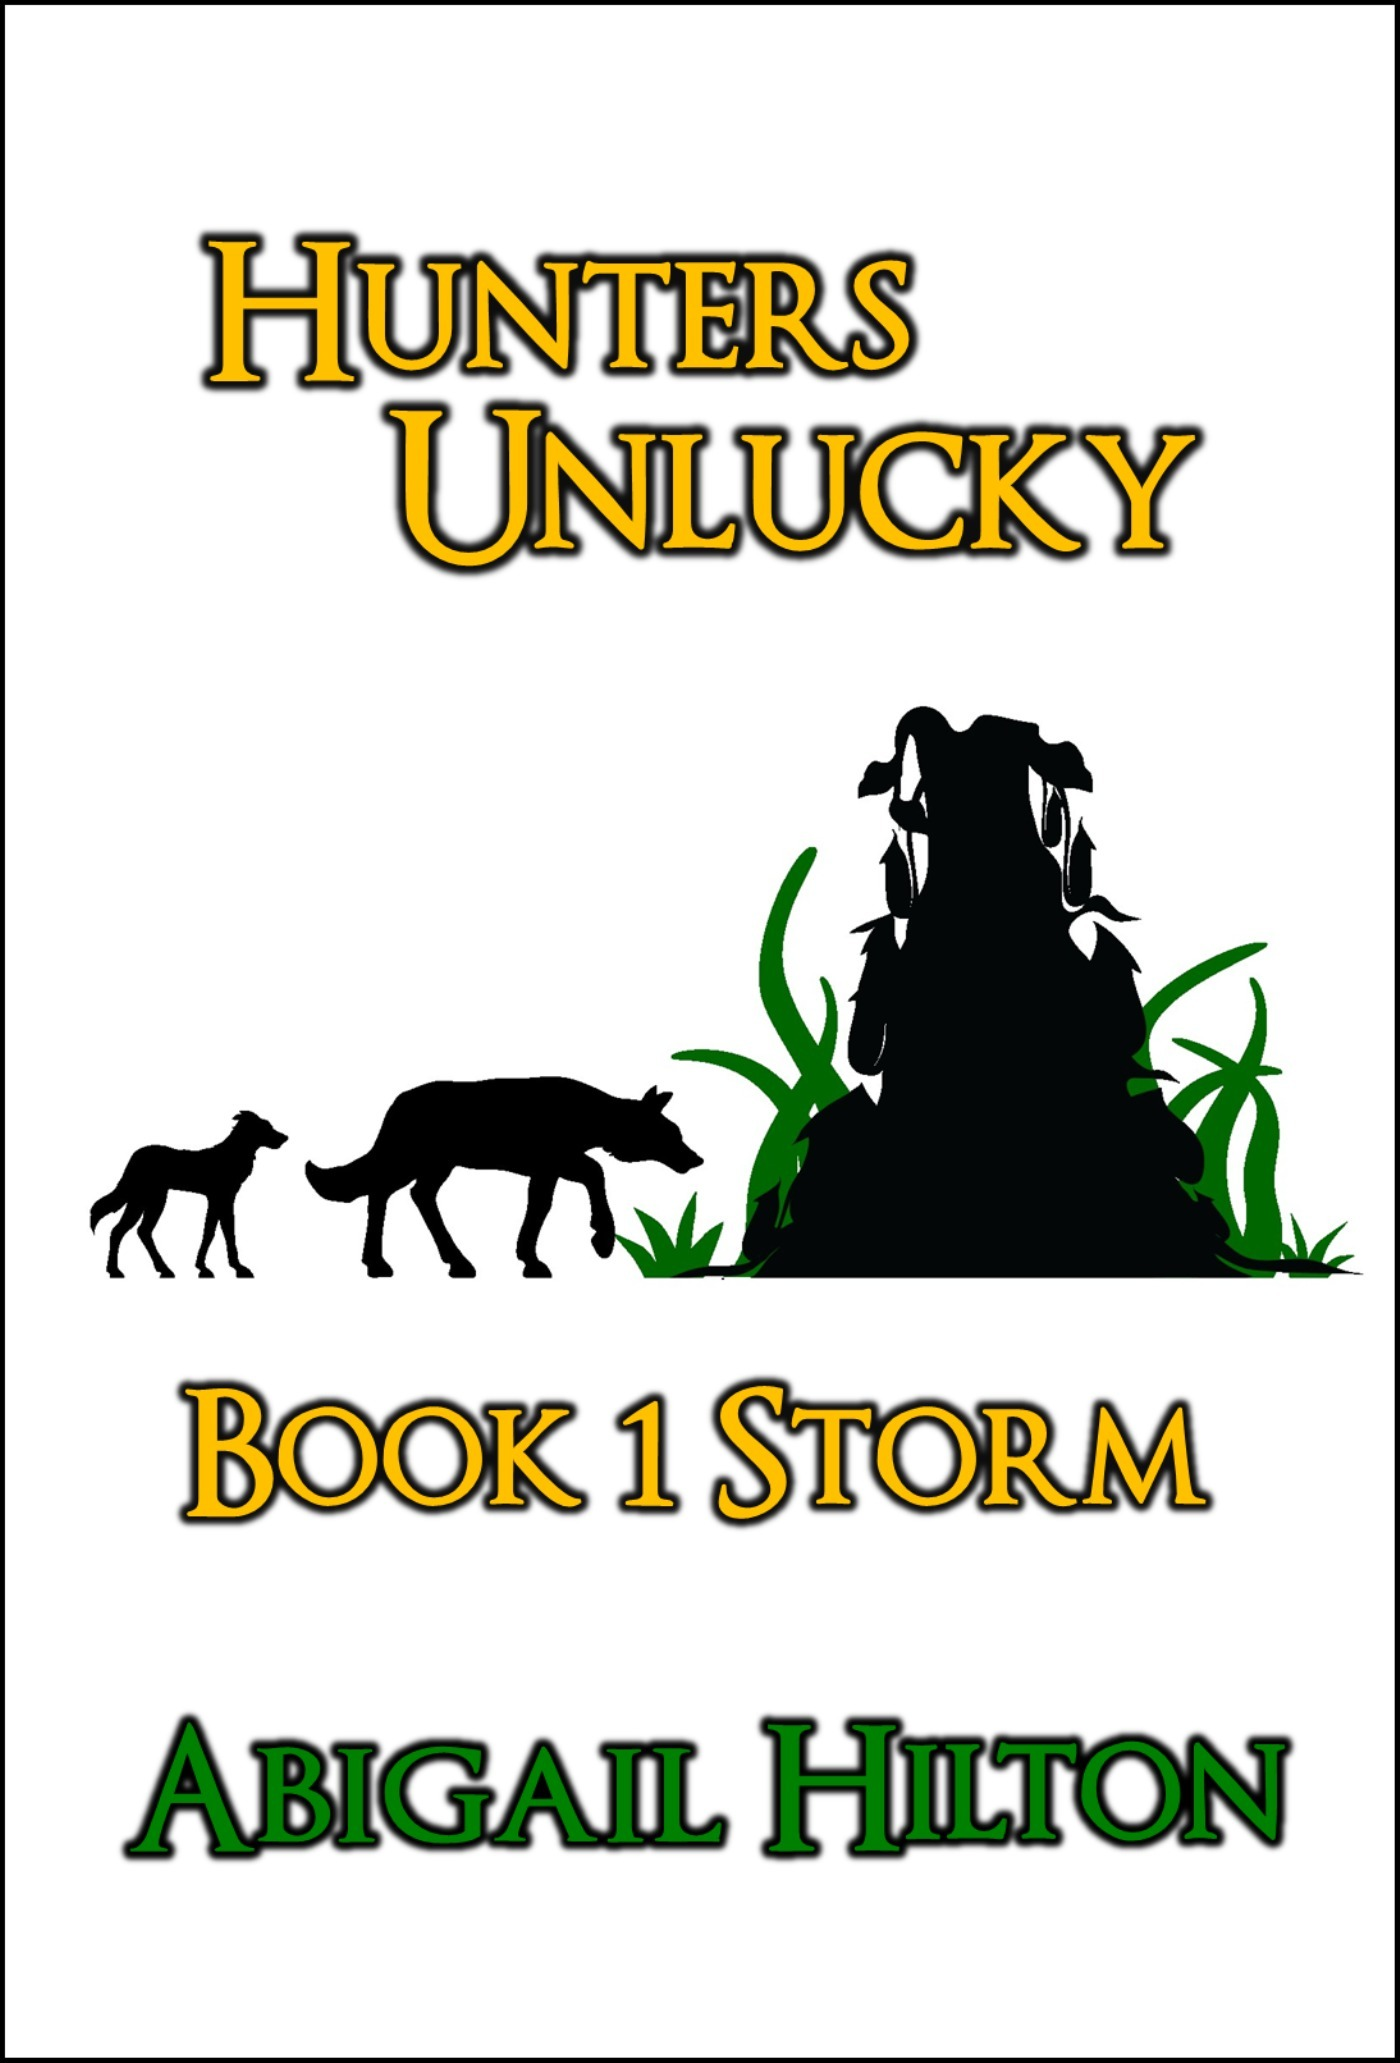 Hunters Unlucky, Book 1 Storm Abigail Hilton